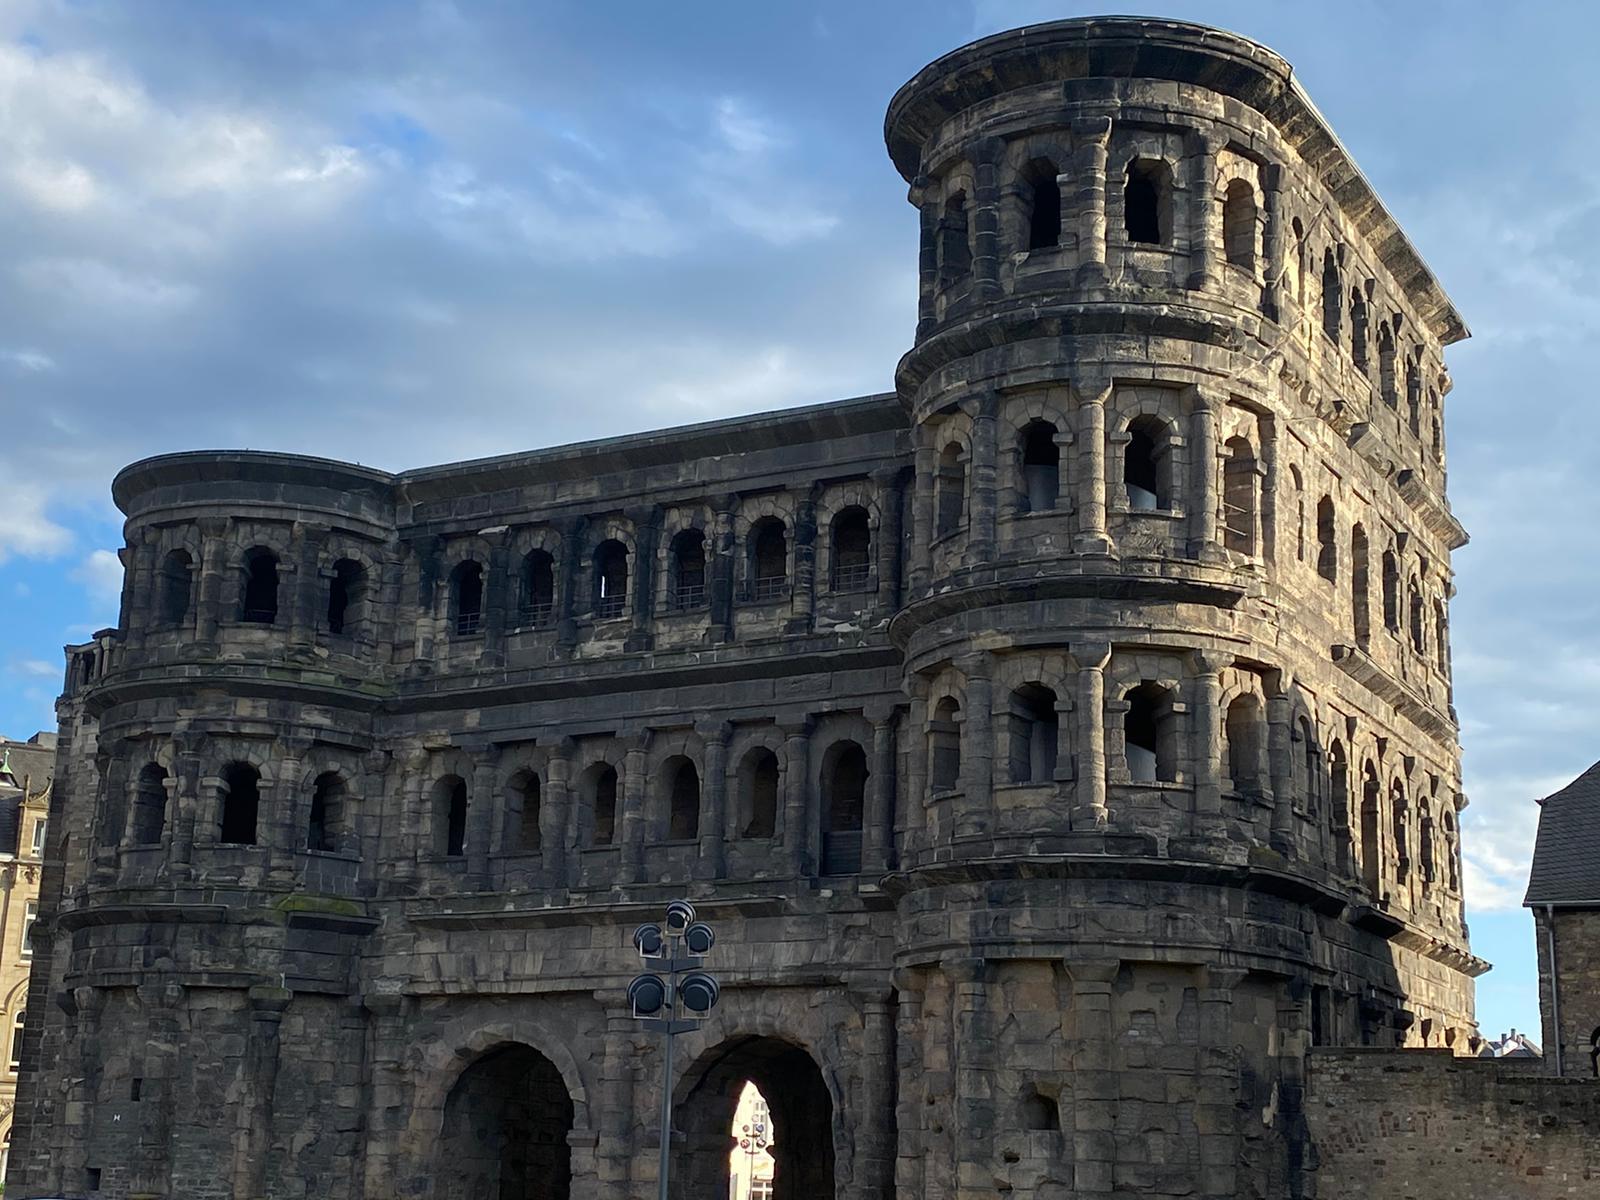 Sehenswürdigkeit Trier: Porta Nigra